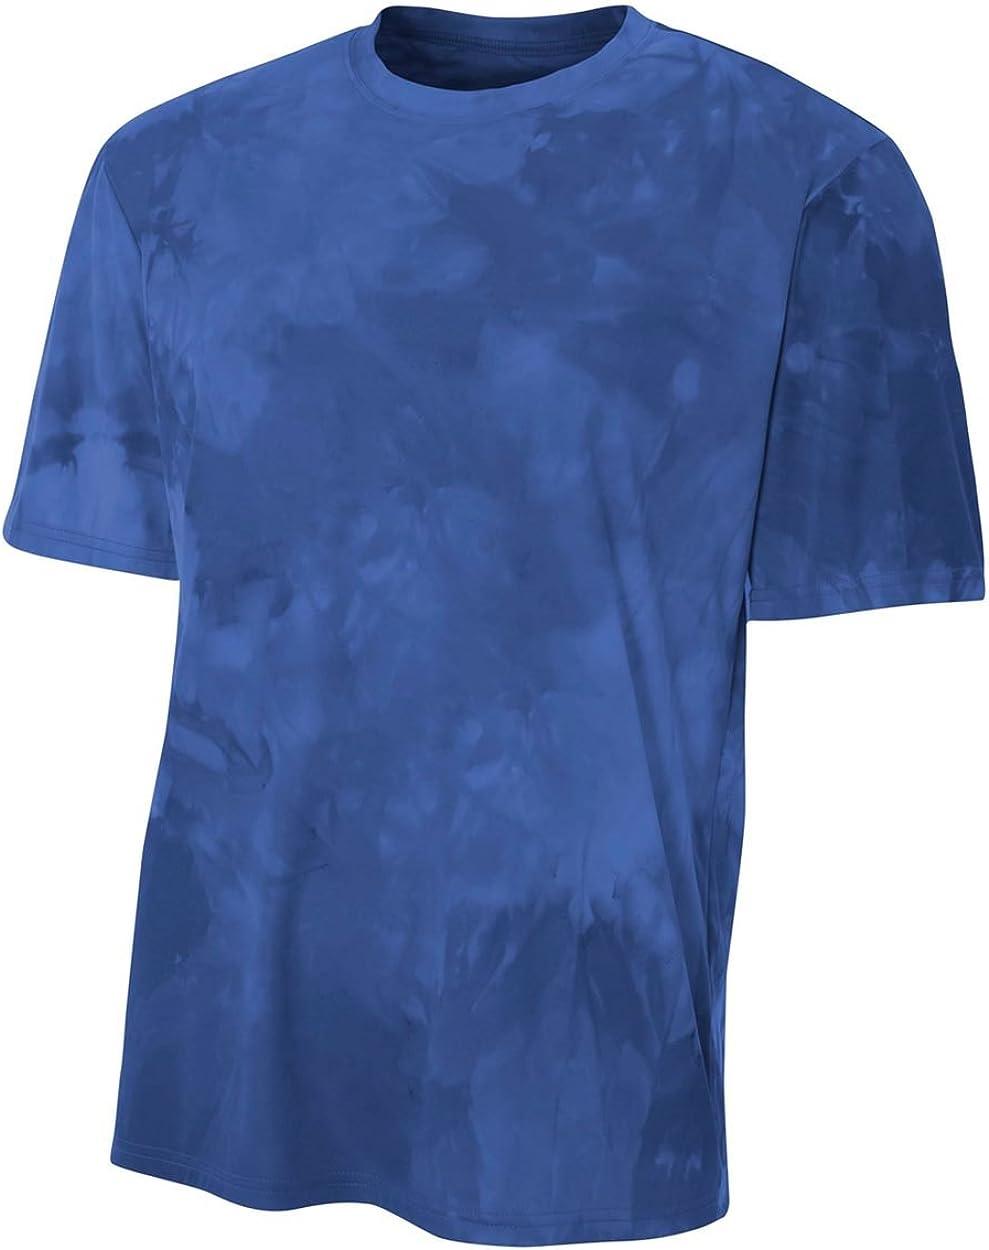 Authentic Sports Shop Navy Blue Mens Adult Medium Cloud Dye Tech Moisture Wicking Cool Base Tee